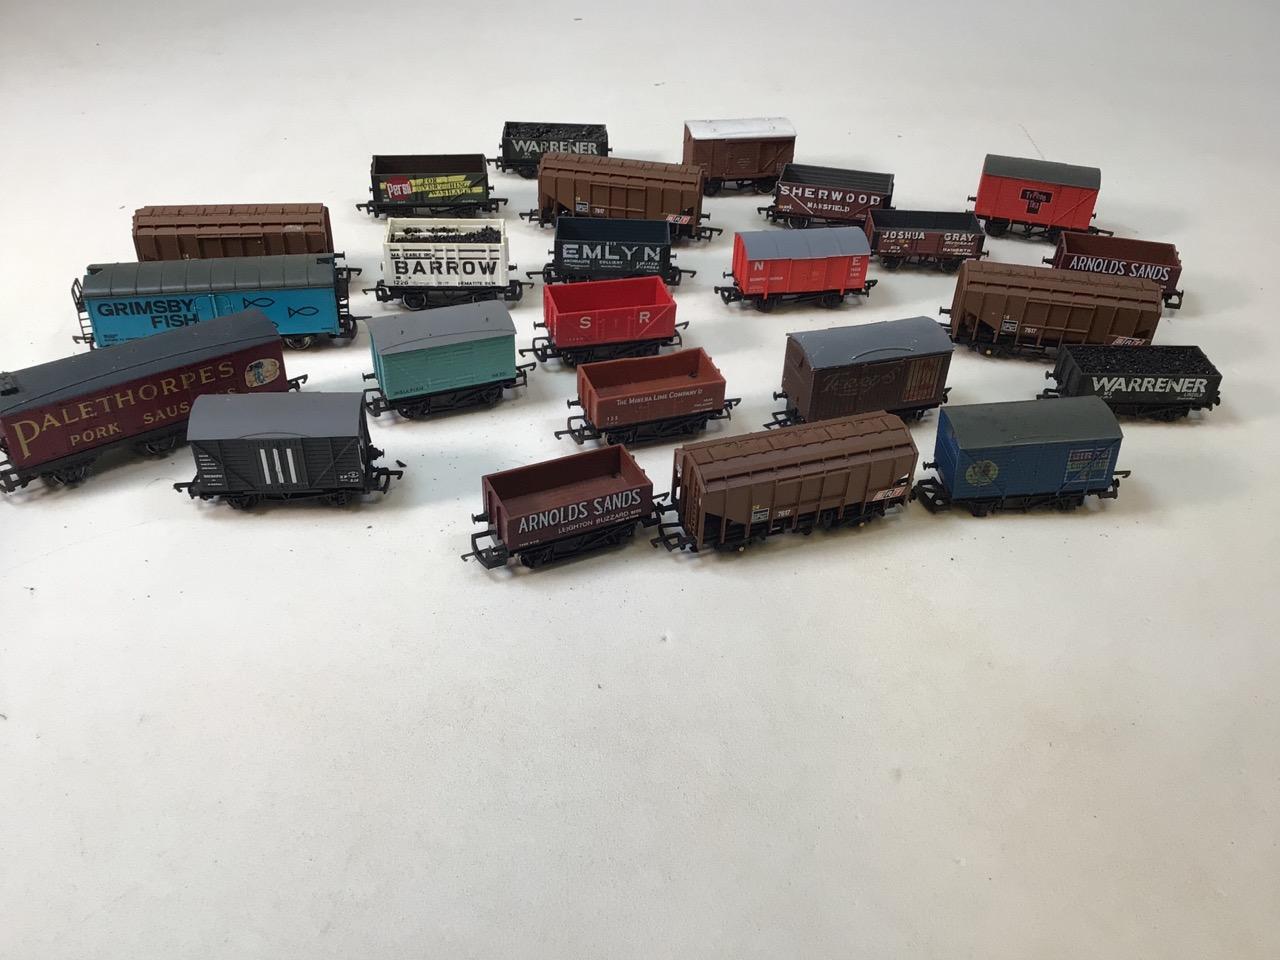 A collection of twenty four 00 gauge railway wagons